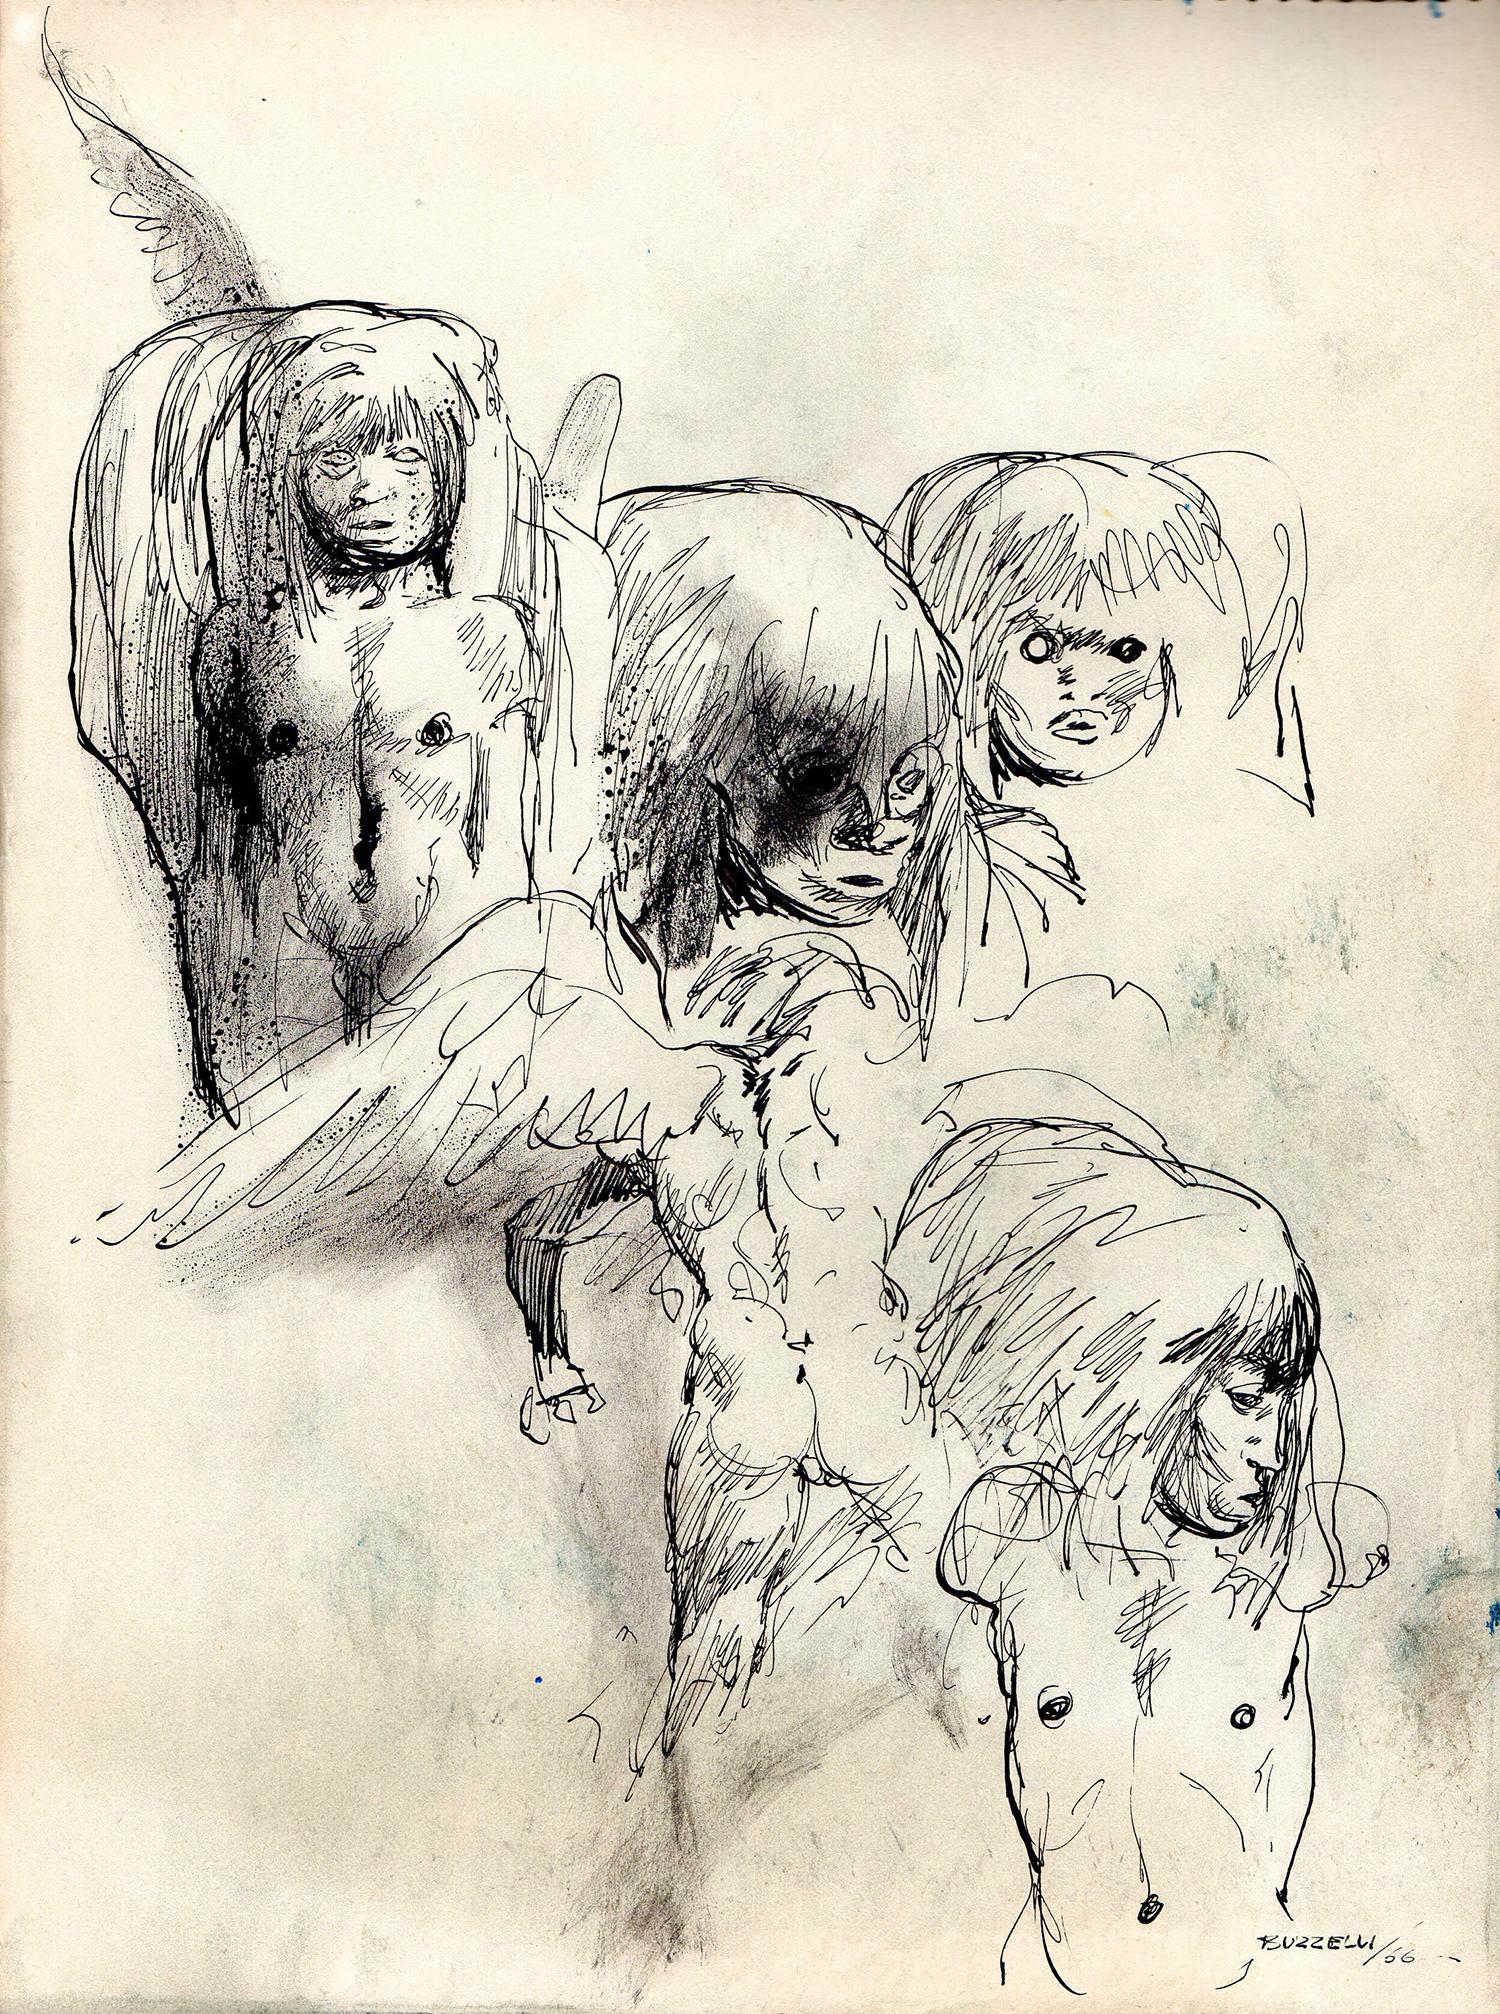 Guido Buzzelli | Quatre figures | Guido Buzzelli